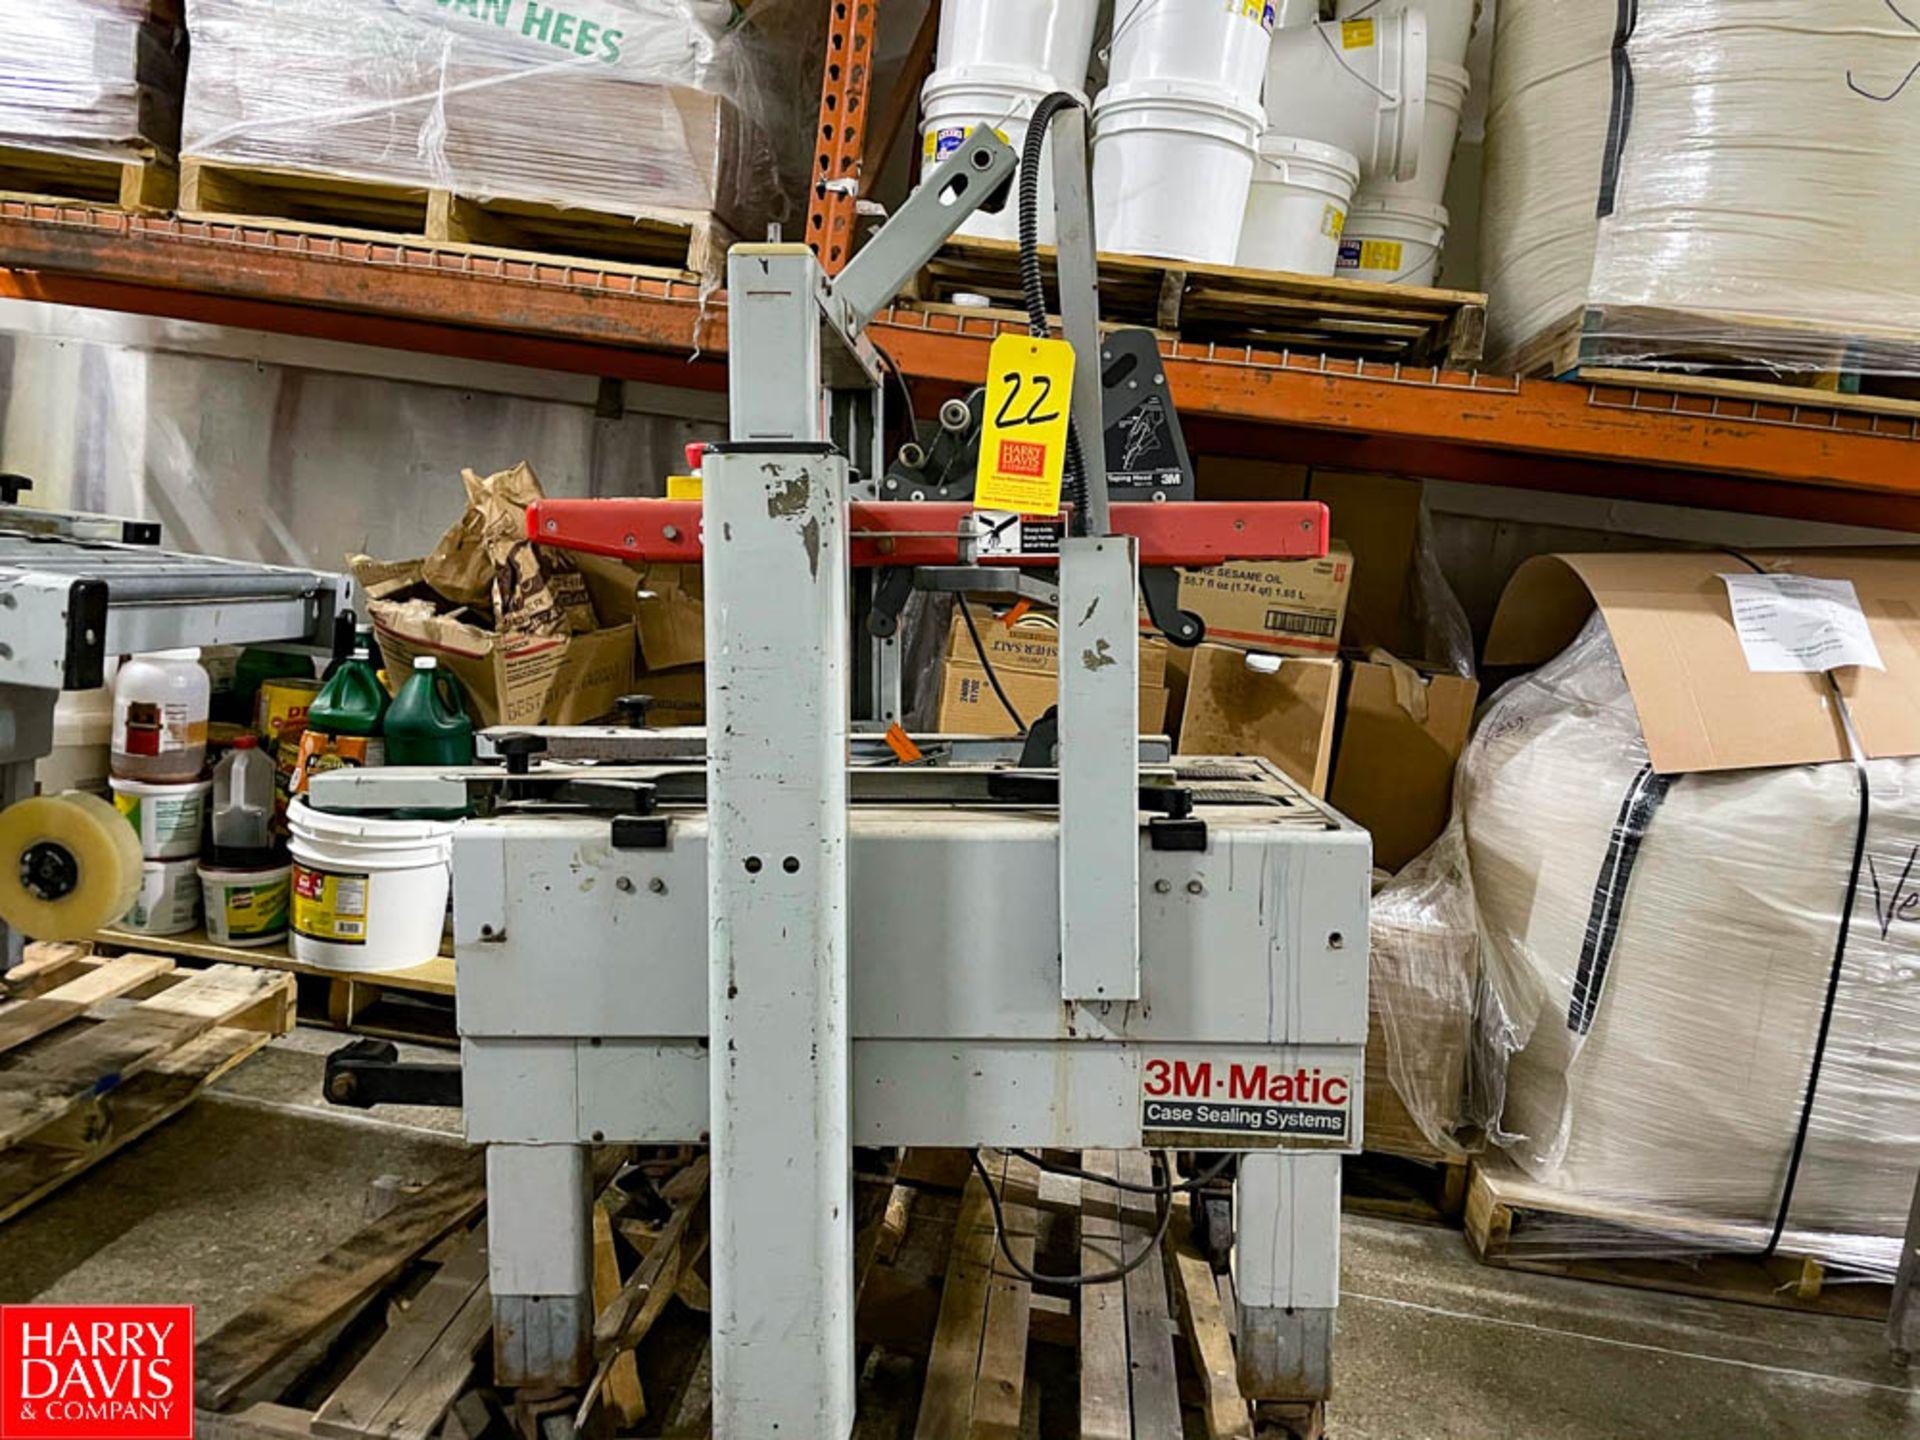 3M-Matic Case Taper Model: 200a SN: 10492, Type: 39600. Rigging Fee: $125